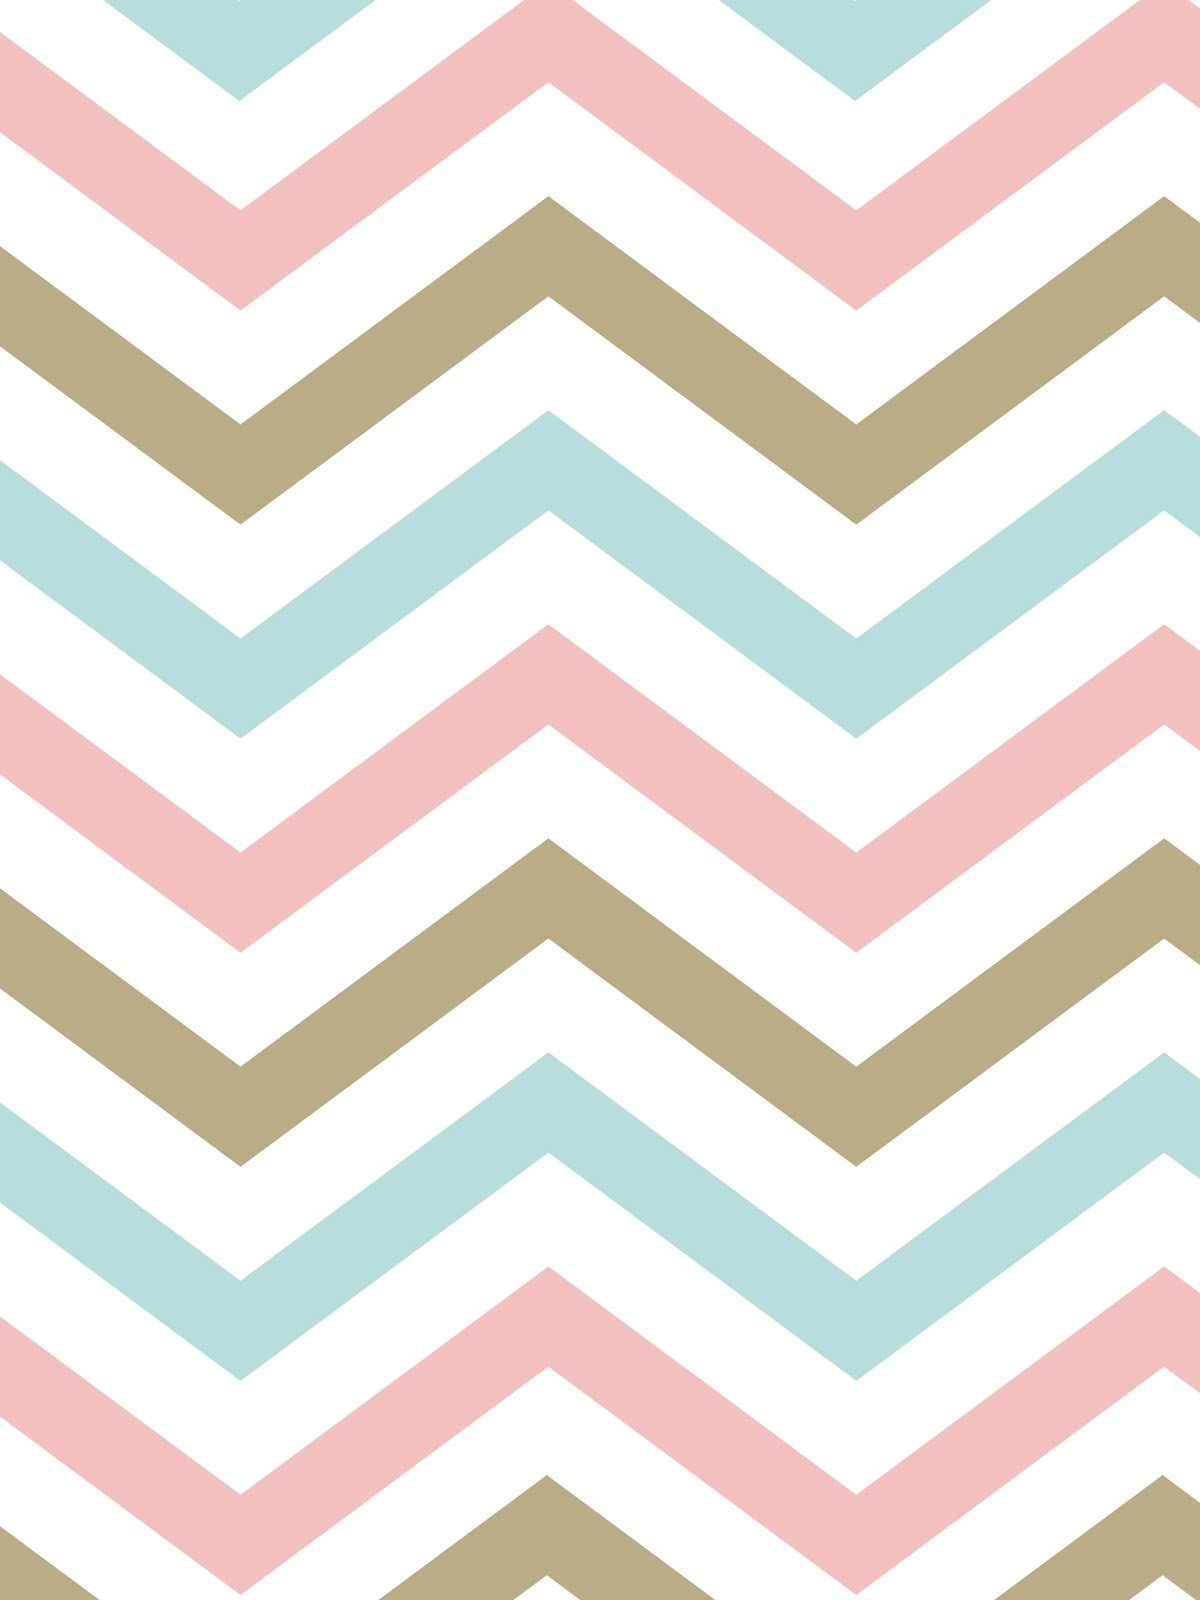 Pink and Gold Background Wallpaper - WallpaperSafari